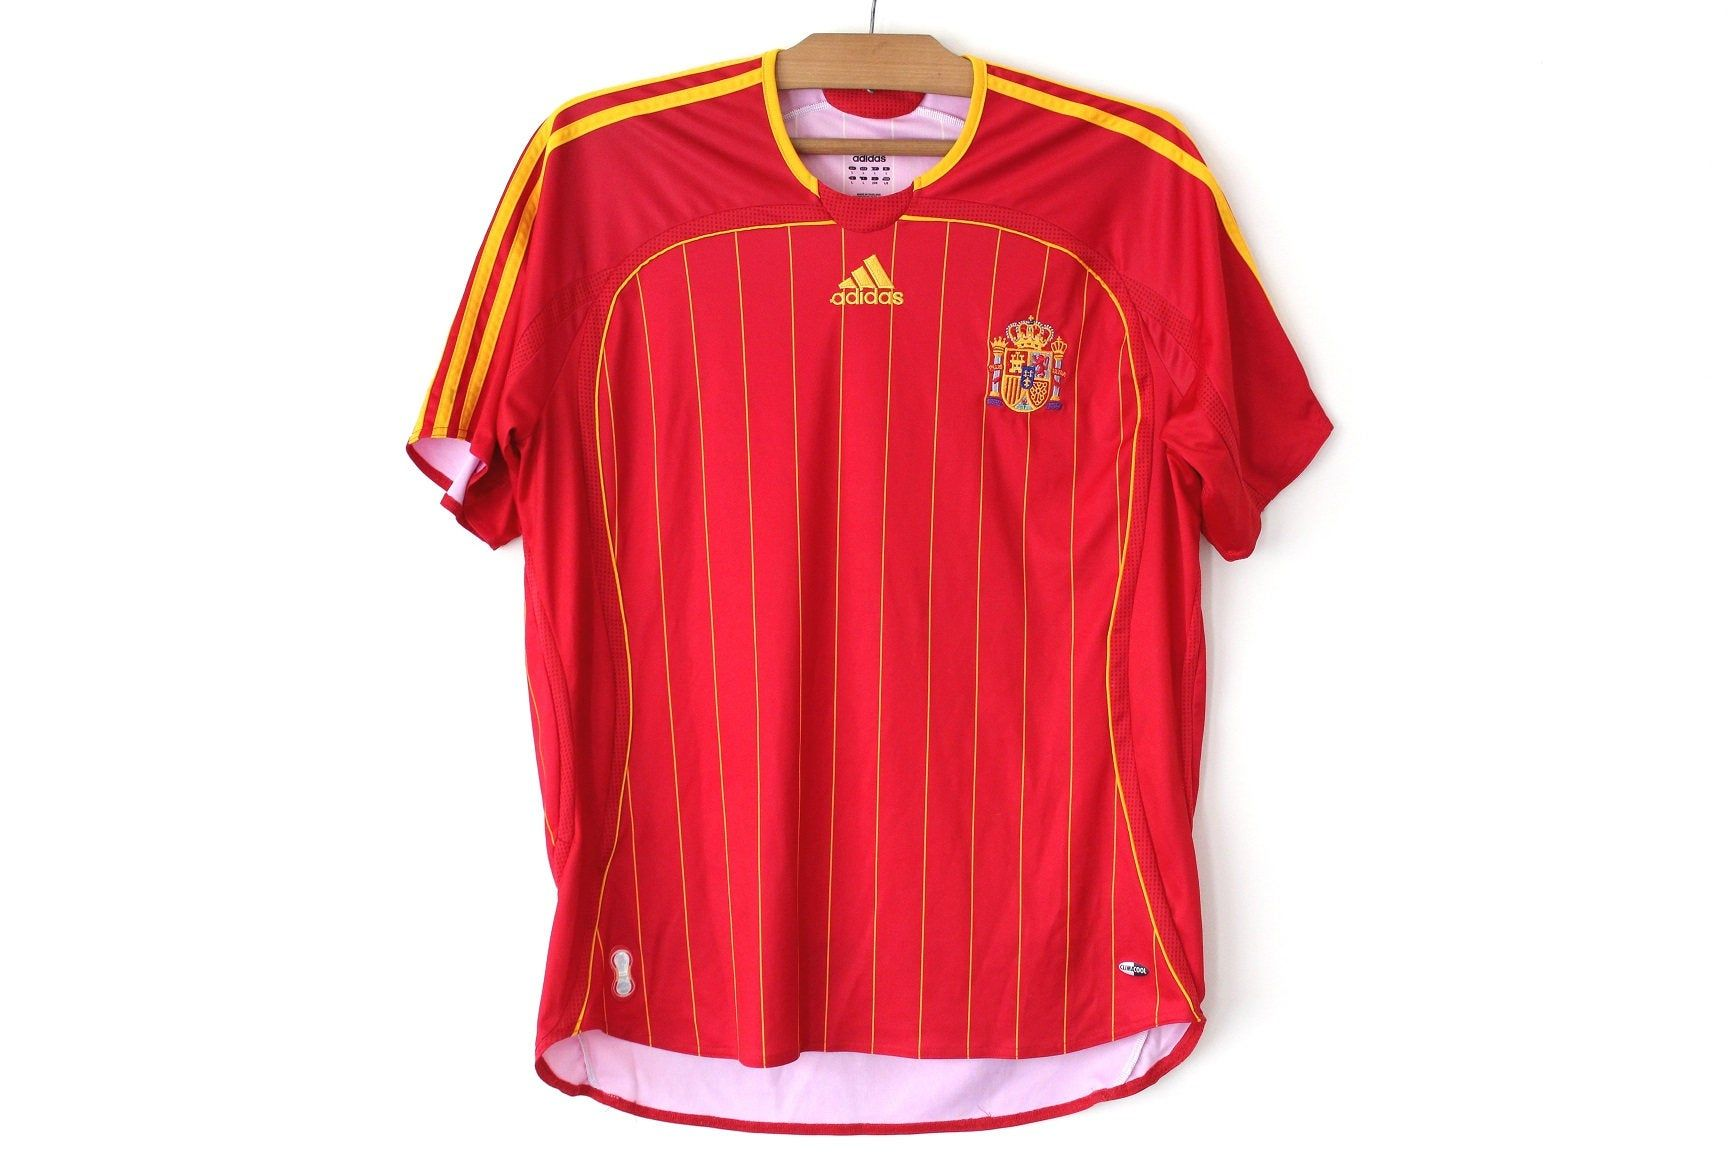 Vintage Adidas Shirt Spain Adidas Jersey Red Adidas Spain Etsy Adidas Shirt Vintage Adidas Red Adidas [ 1152 x 1728 Pixel ]